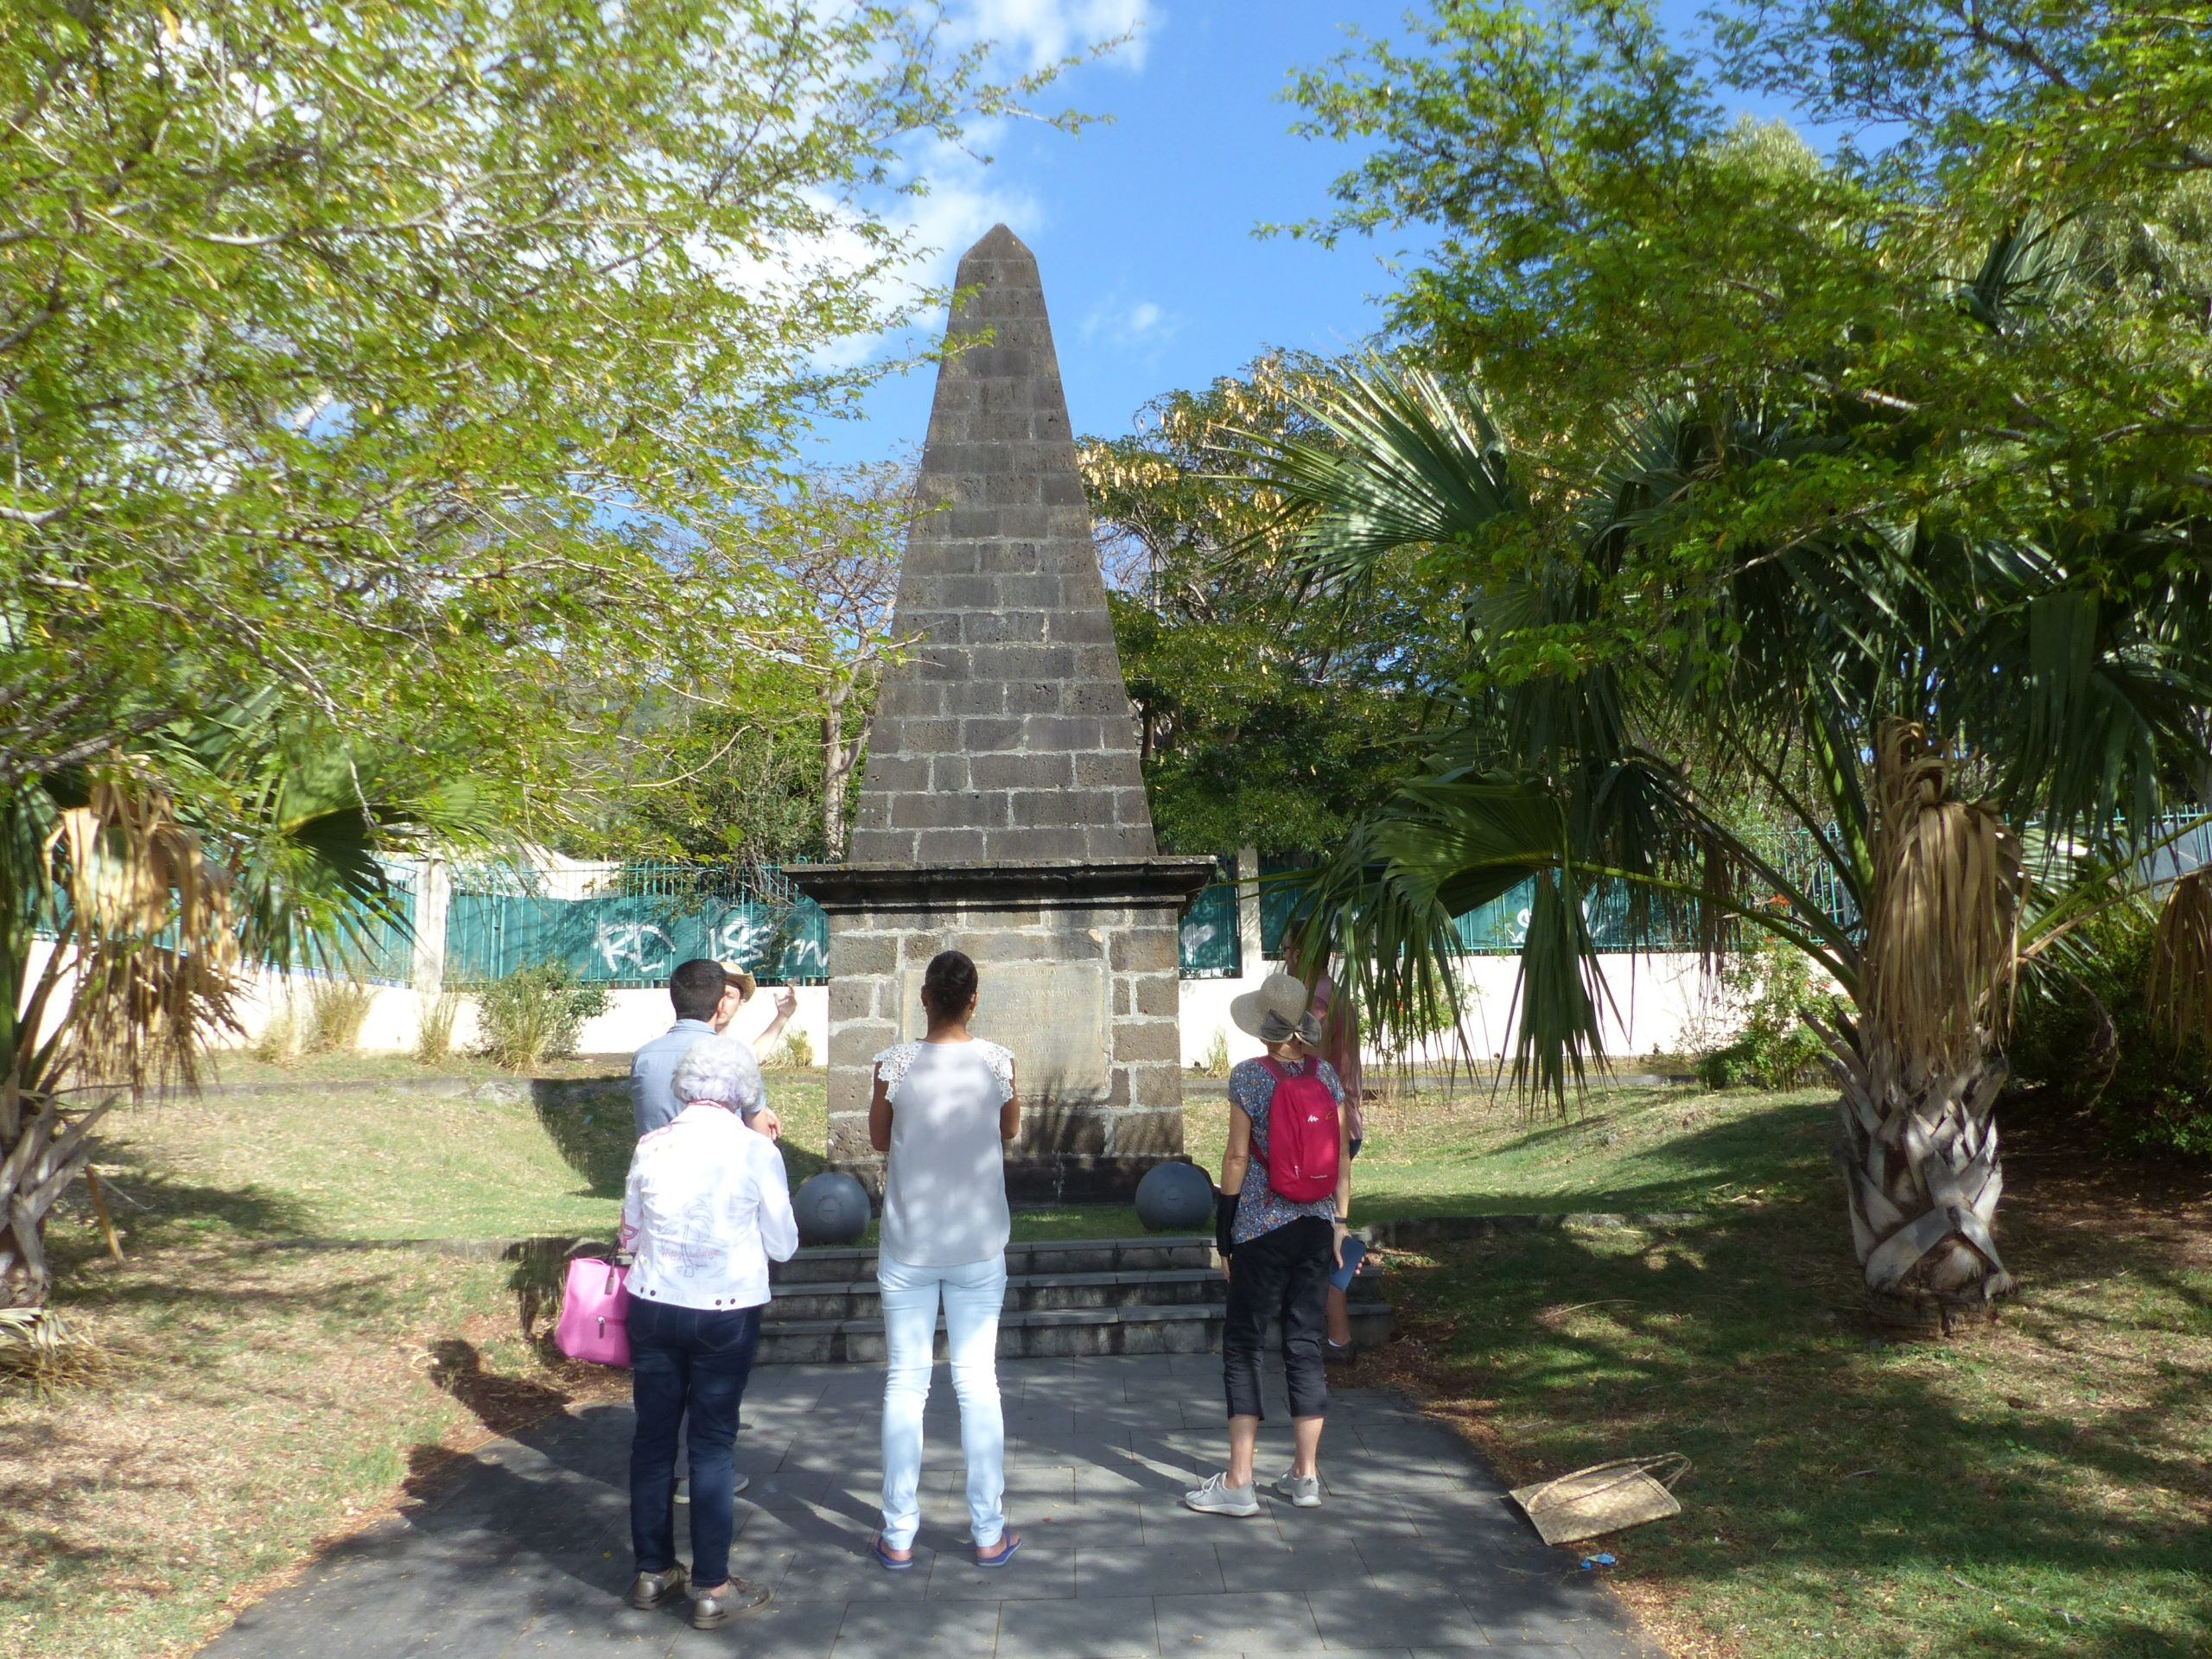 Tikatsou patrimoine : défendre Saint-Denis